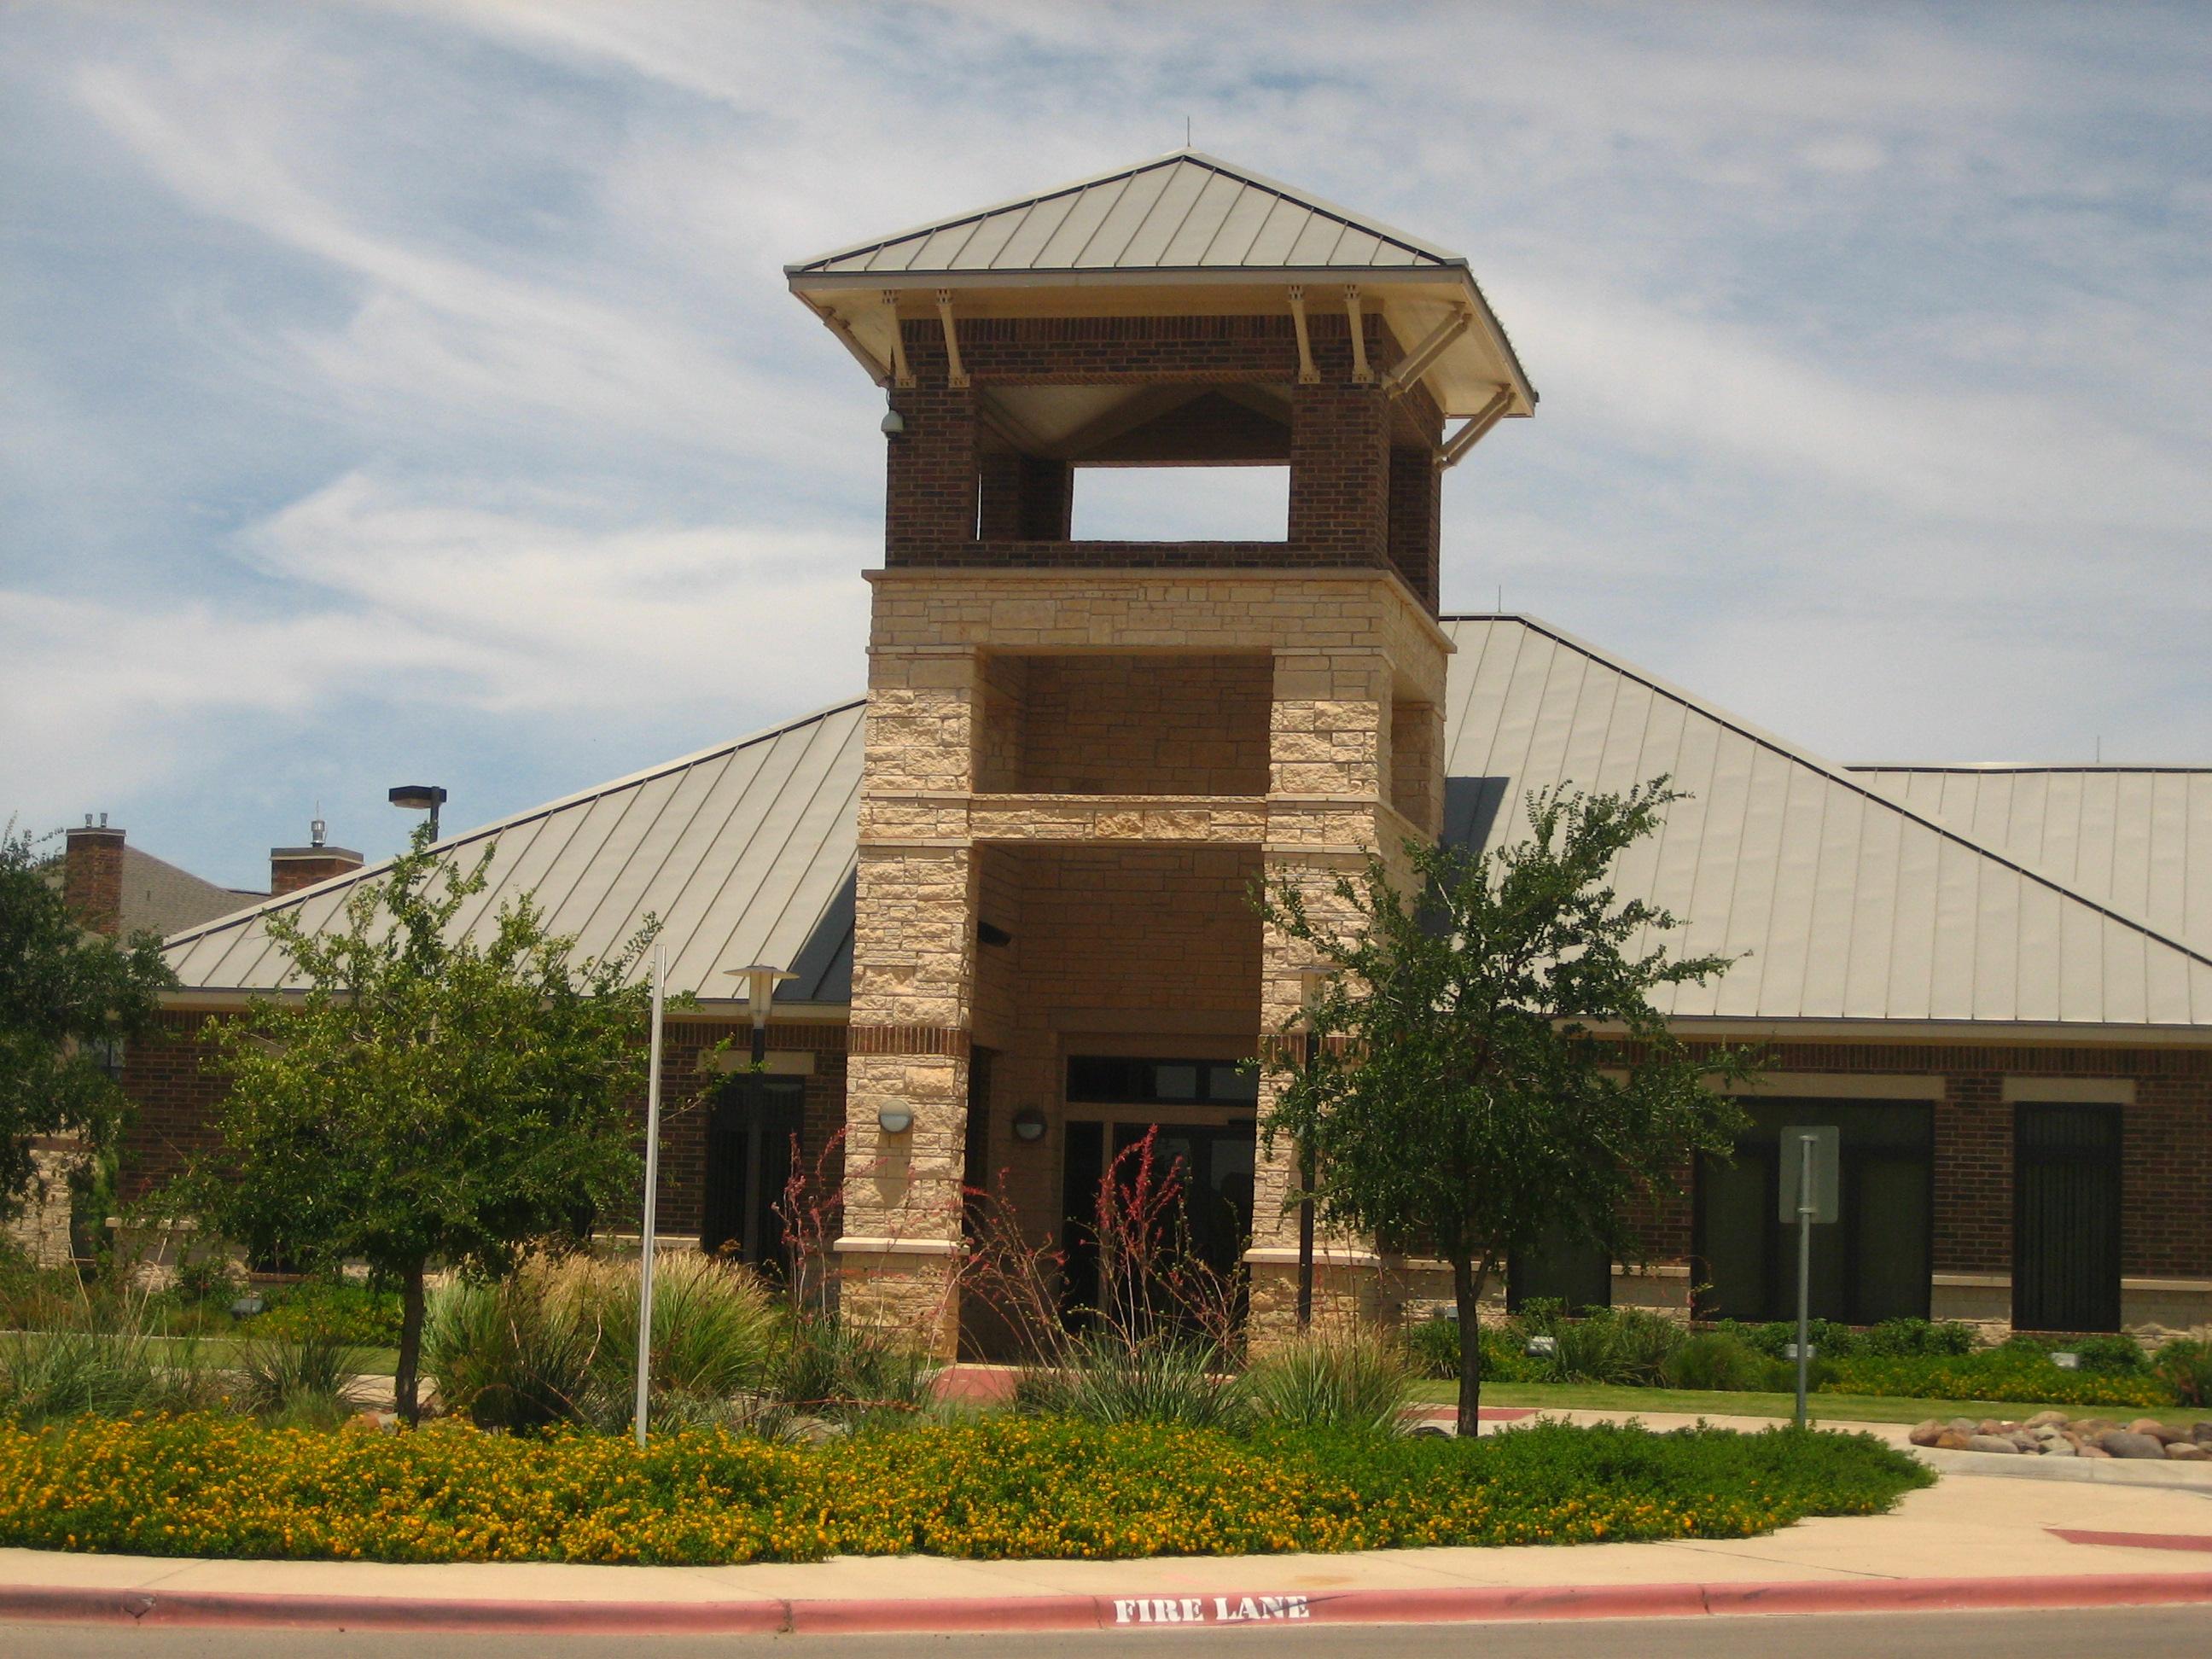 zero waste universities include Texas